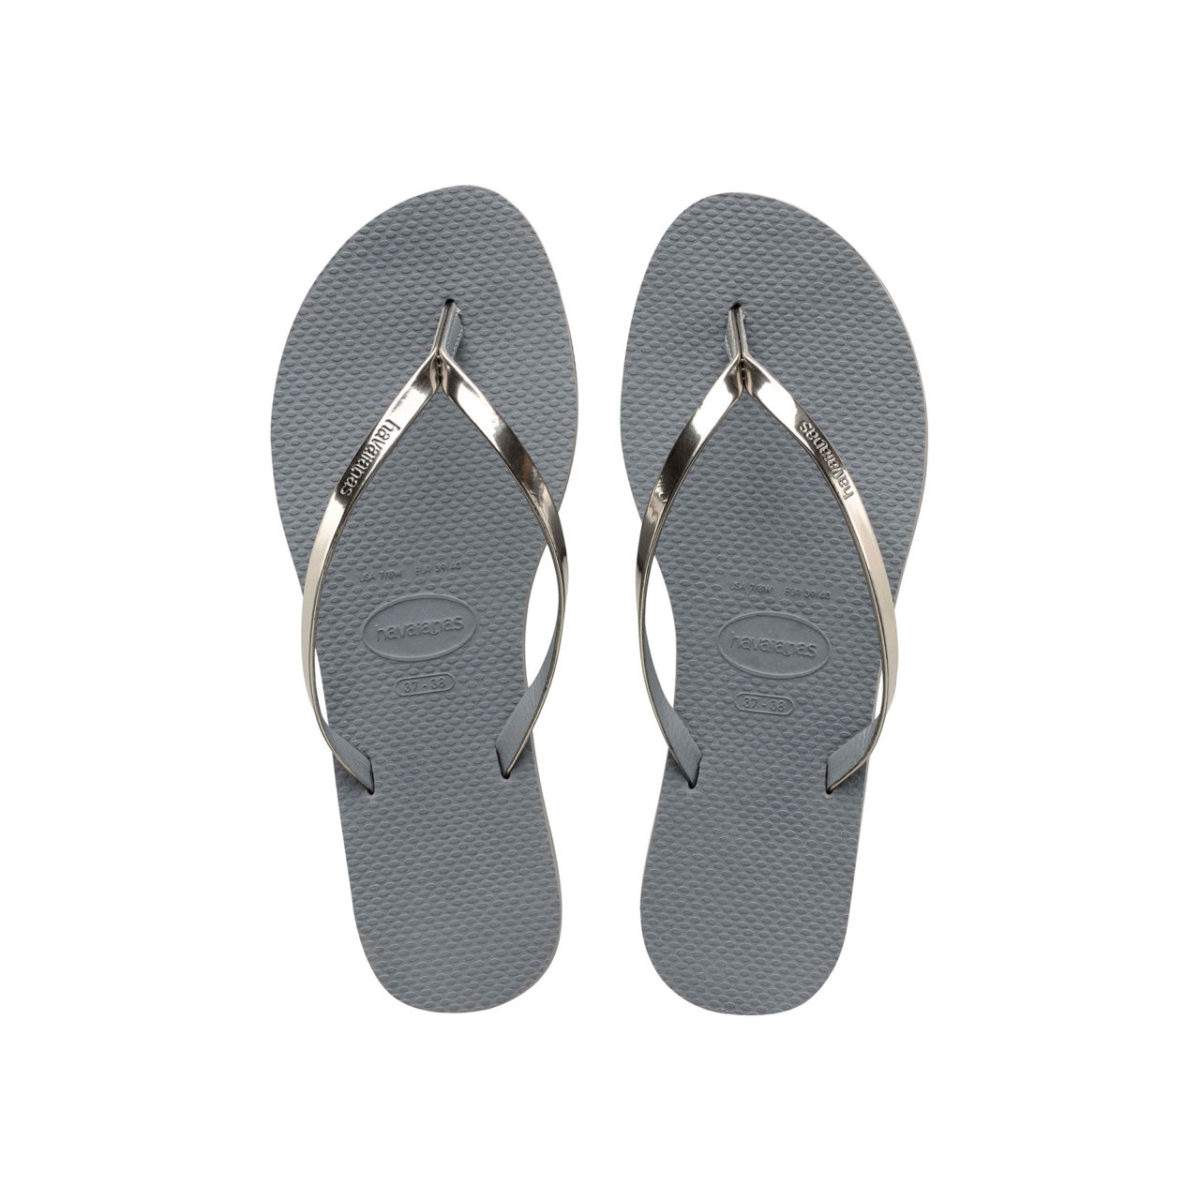 Havaianas Flipflops Sandale Badeschuh Zehentrenner You Metallic Steel Grey Badelatschen Badeschlappen Aufsicht